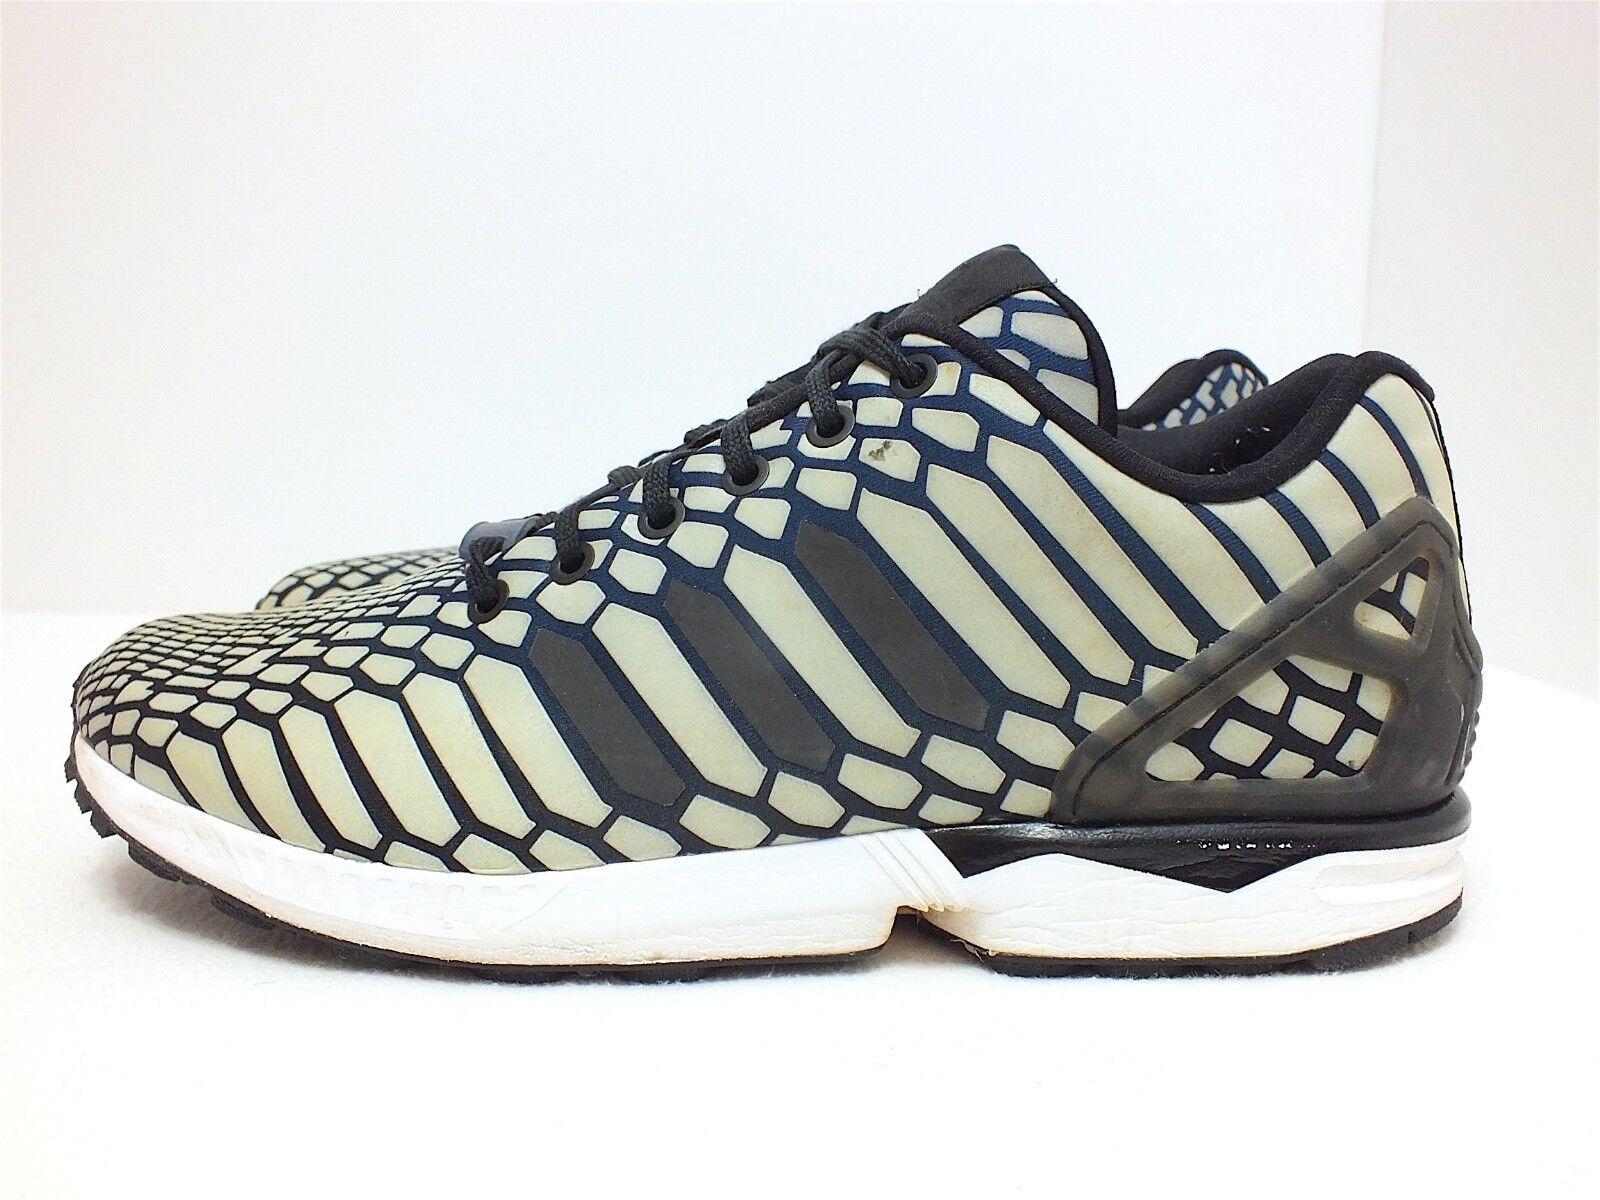 Adidas originali originali originali zx flusso xeno uomini scarpe da corsa marina   nero   bianco numero 10 (usa) | Shop  | Sig/Sig Ra Scarpa  58dbc5